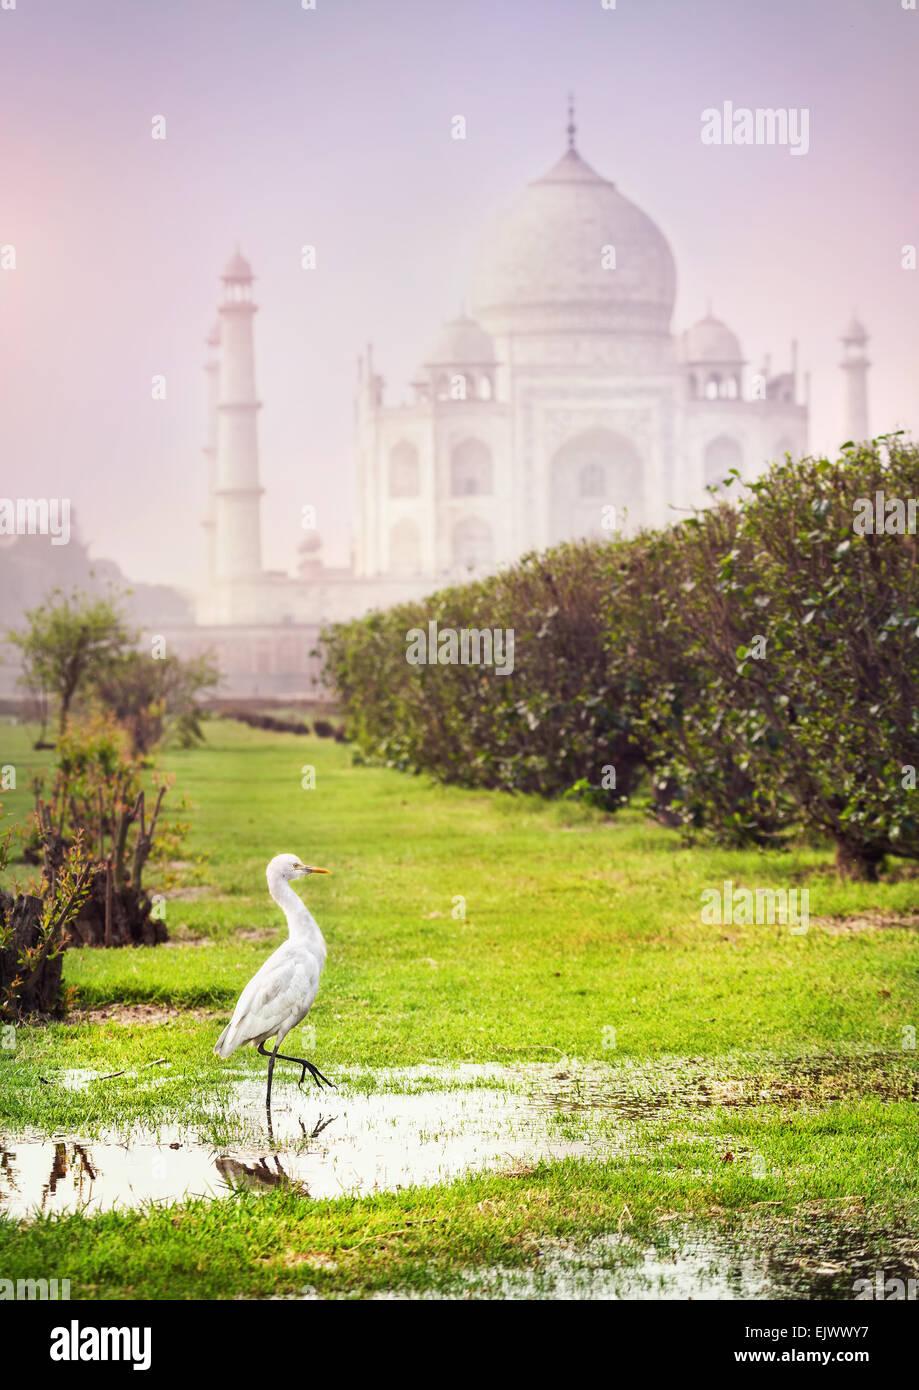 Weißer Reiher im Mehtab Bagh Garten mit Taj Mahal in Agra, Uttar Pradesh, Indien Stockbild